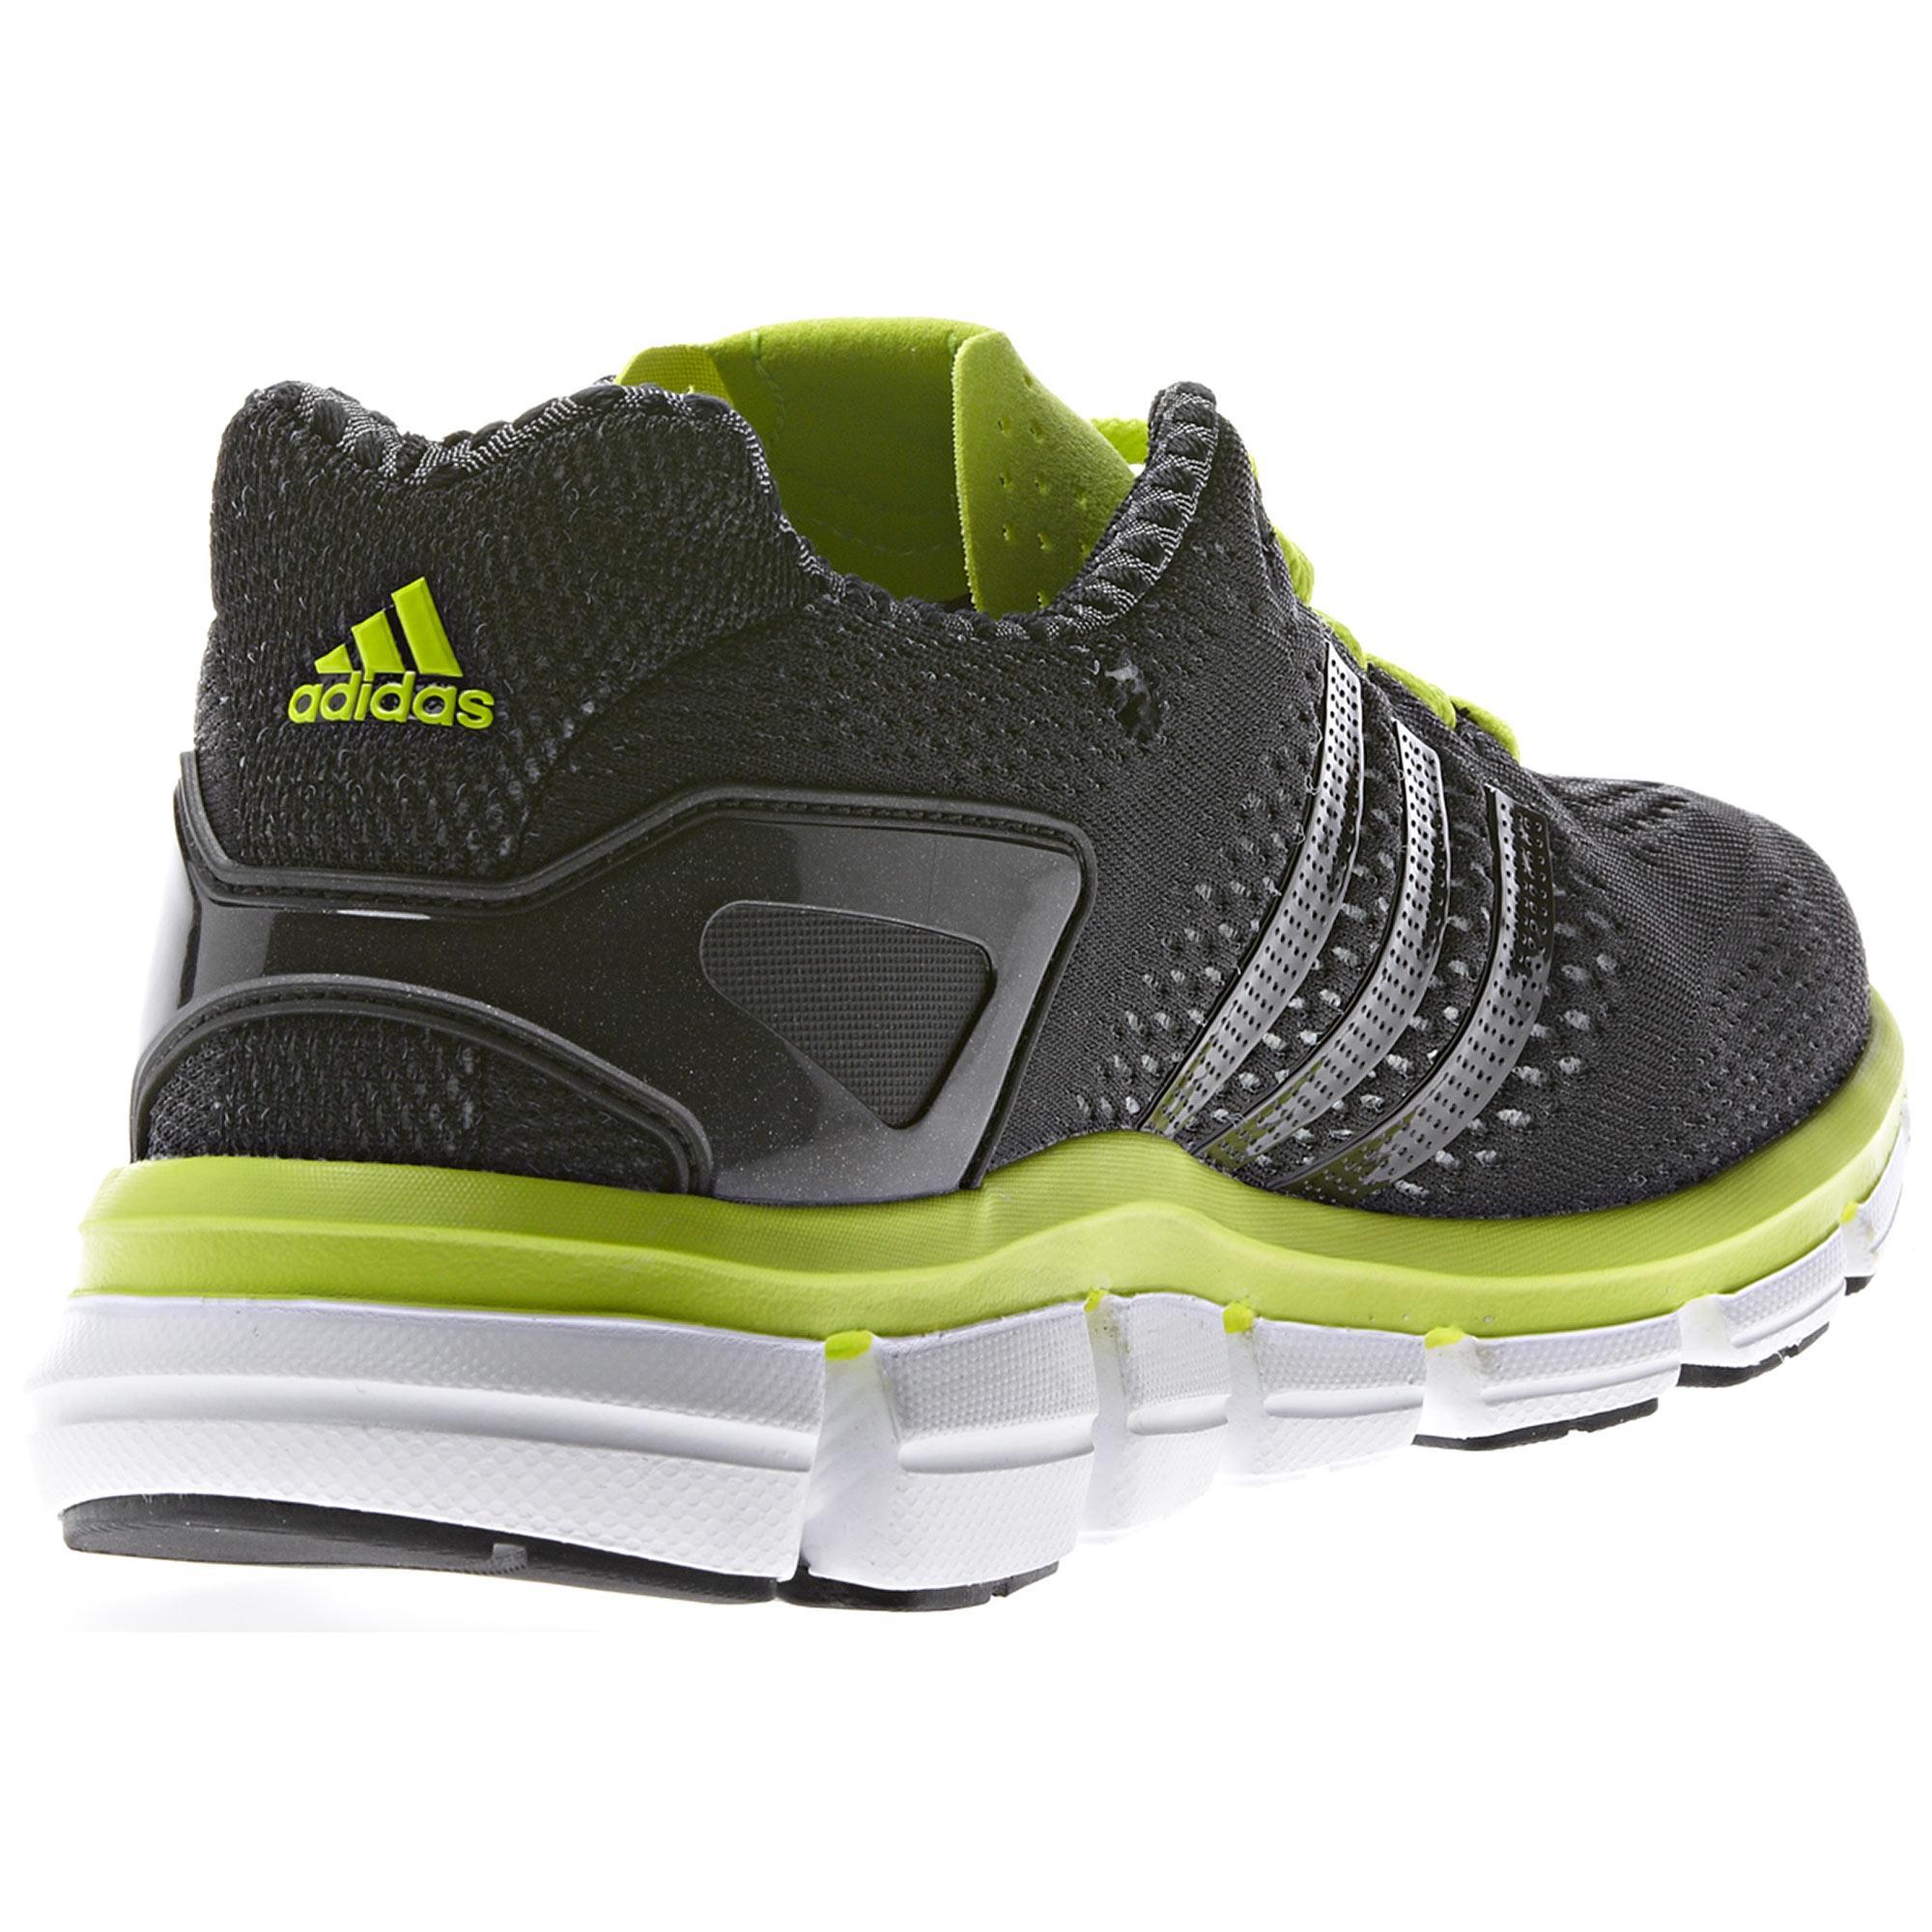 adidas mens climacool ride running shoes black solar. Black Bedroom Furniture Sets. Home Design Ideas